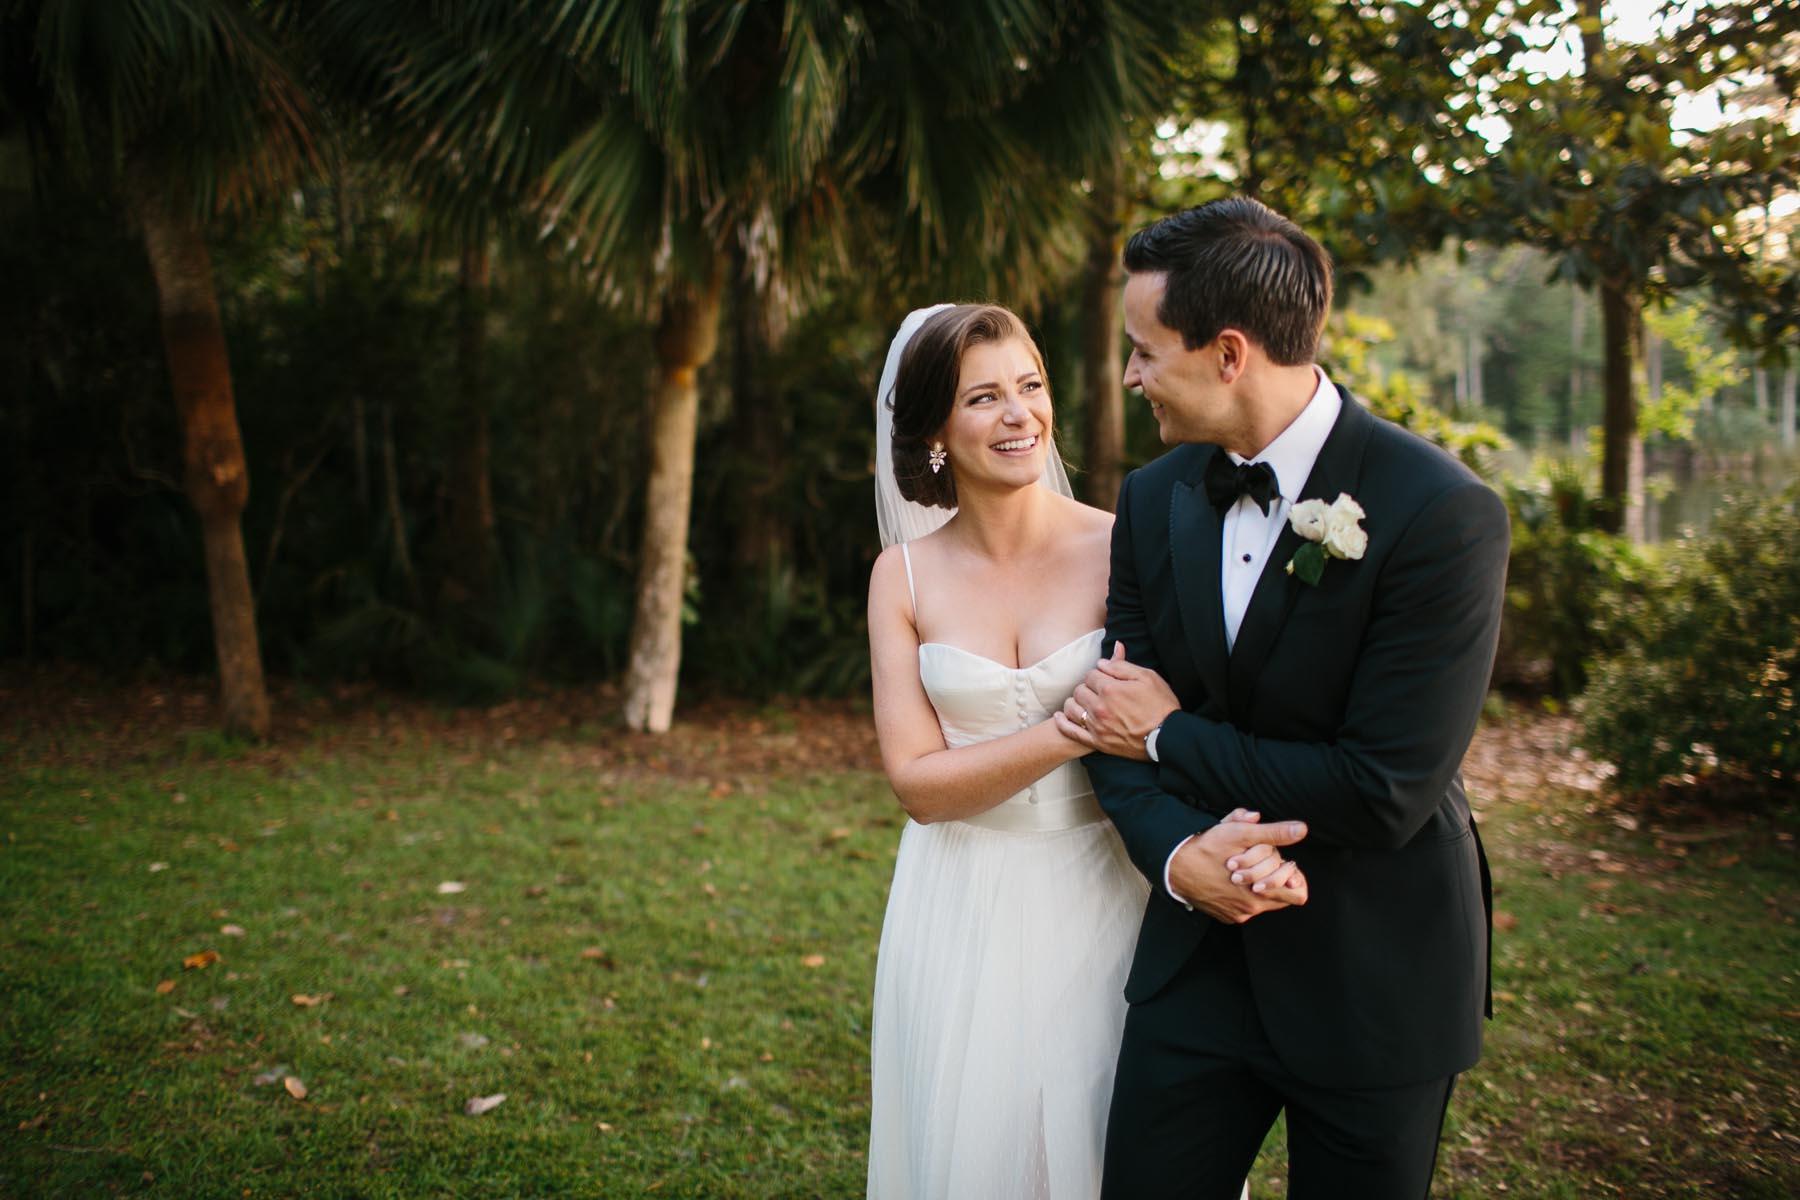 lowry wedding blog eden garden florida wedding-106